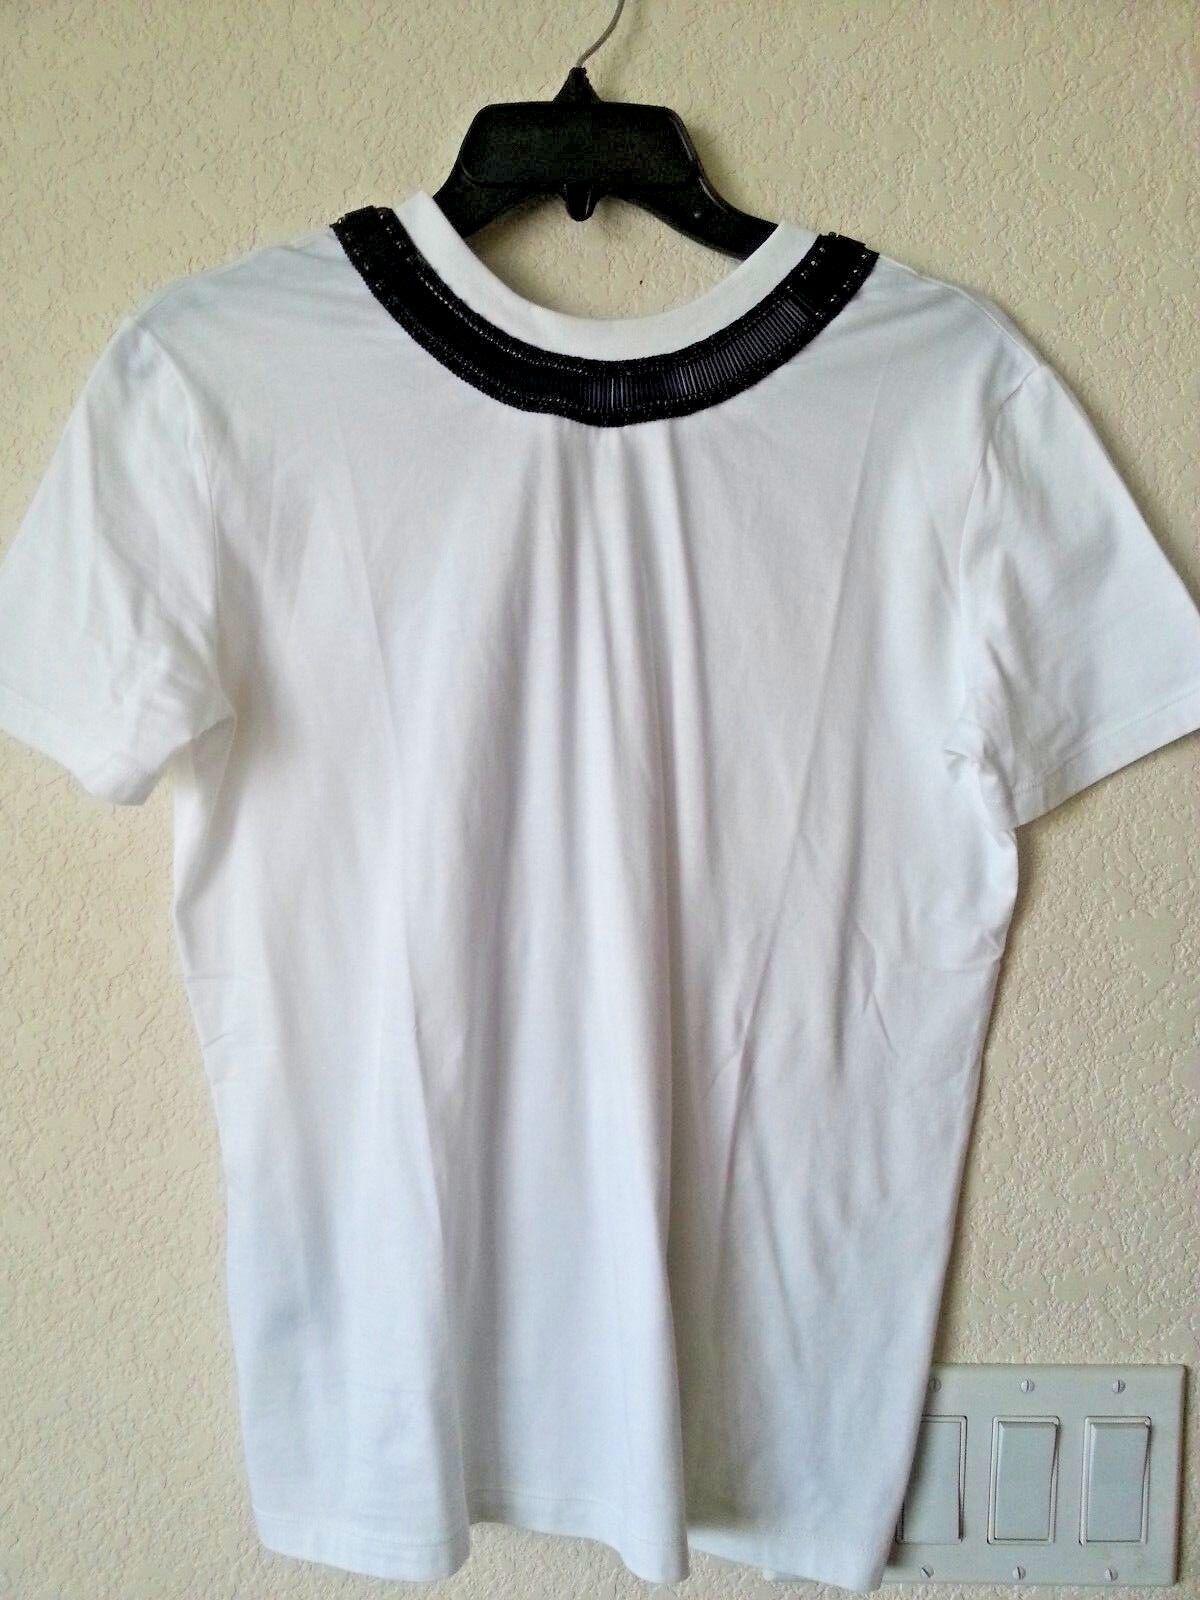 NEW Prada Weiß Cotton Top T-Shirt Embellished schwarz Beads Ribbon Sz S